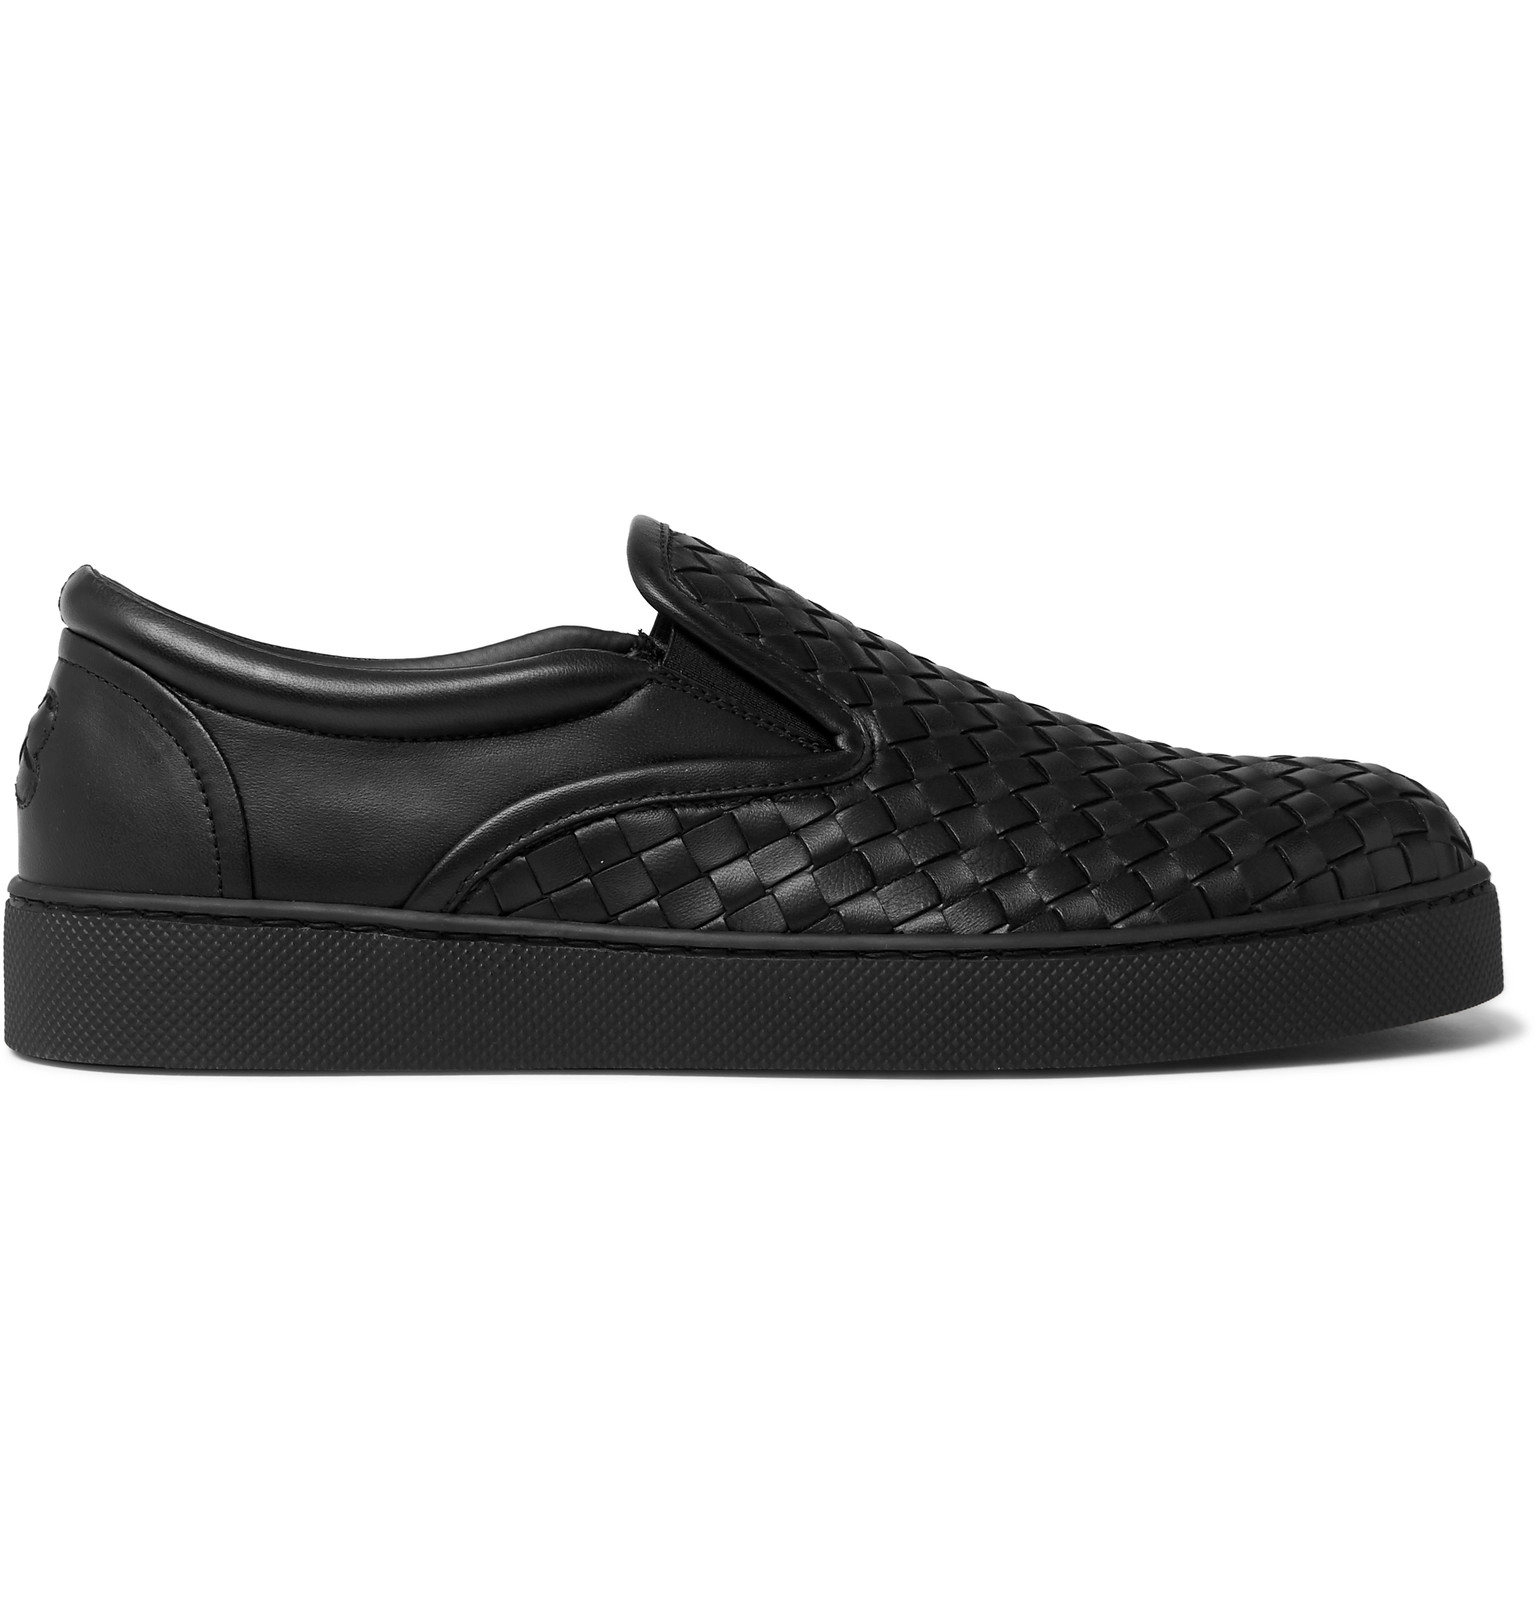 e6daa29281eb Bottega Veneta - Dodger Intrecciato Leather Slip-On Sneakers